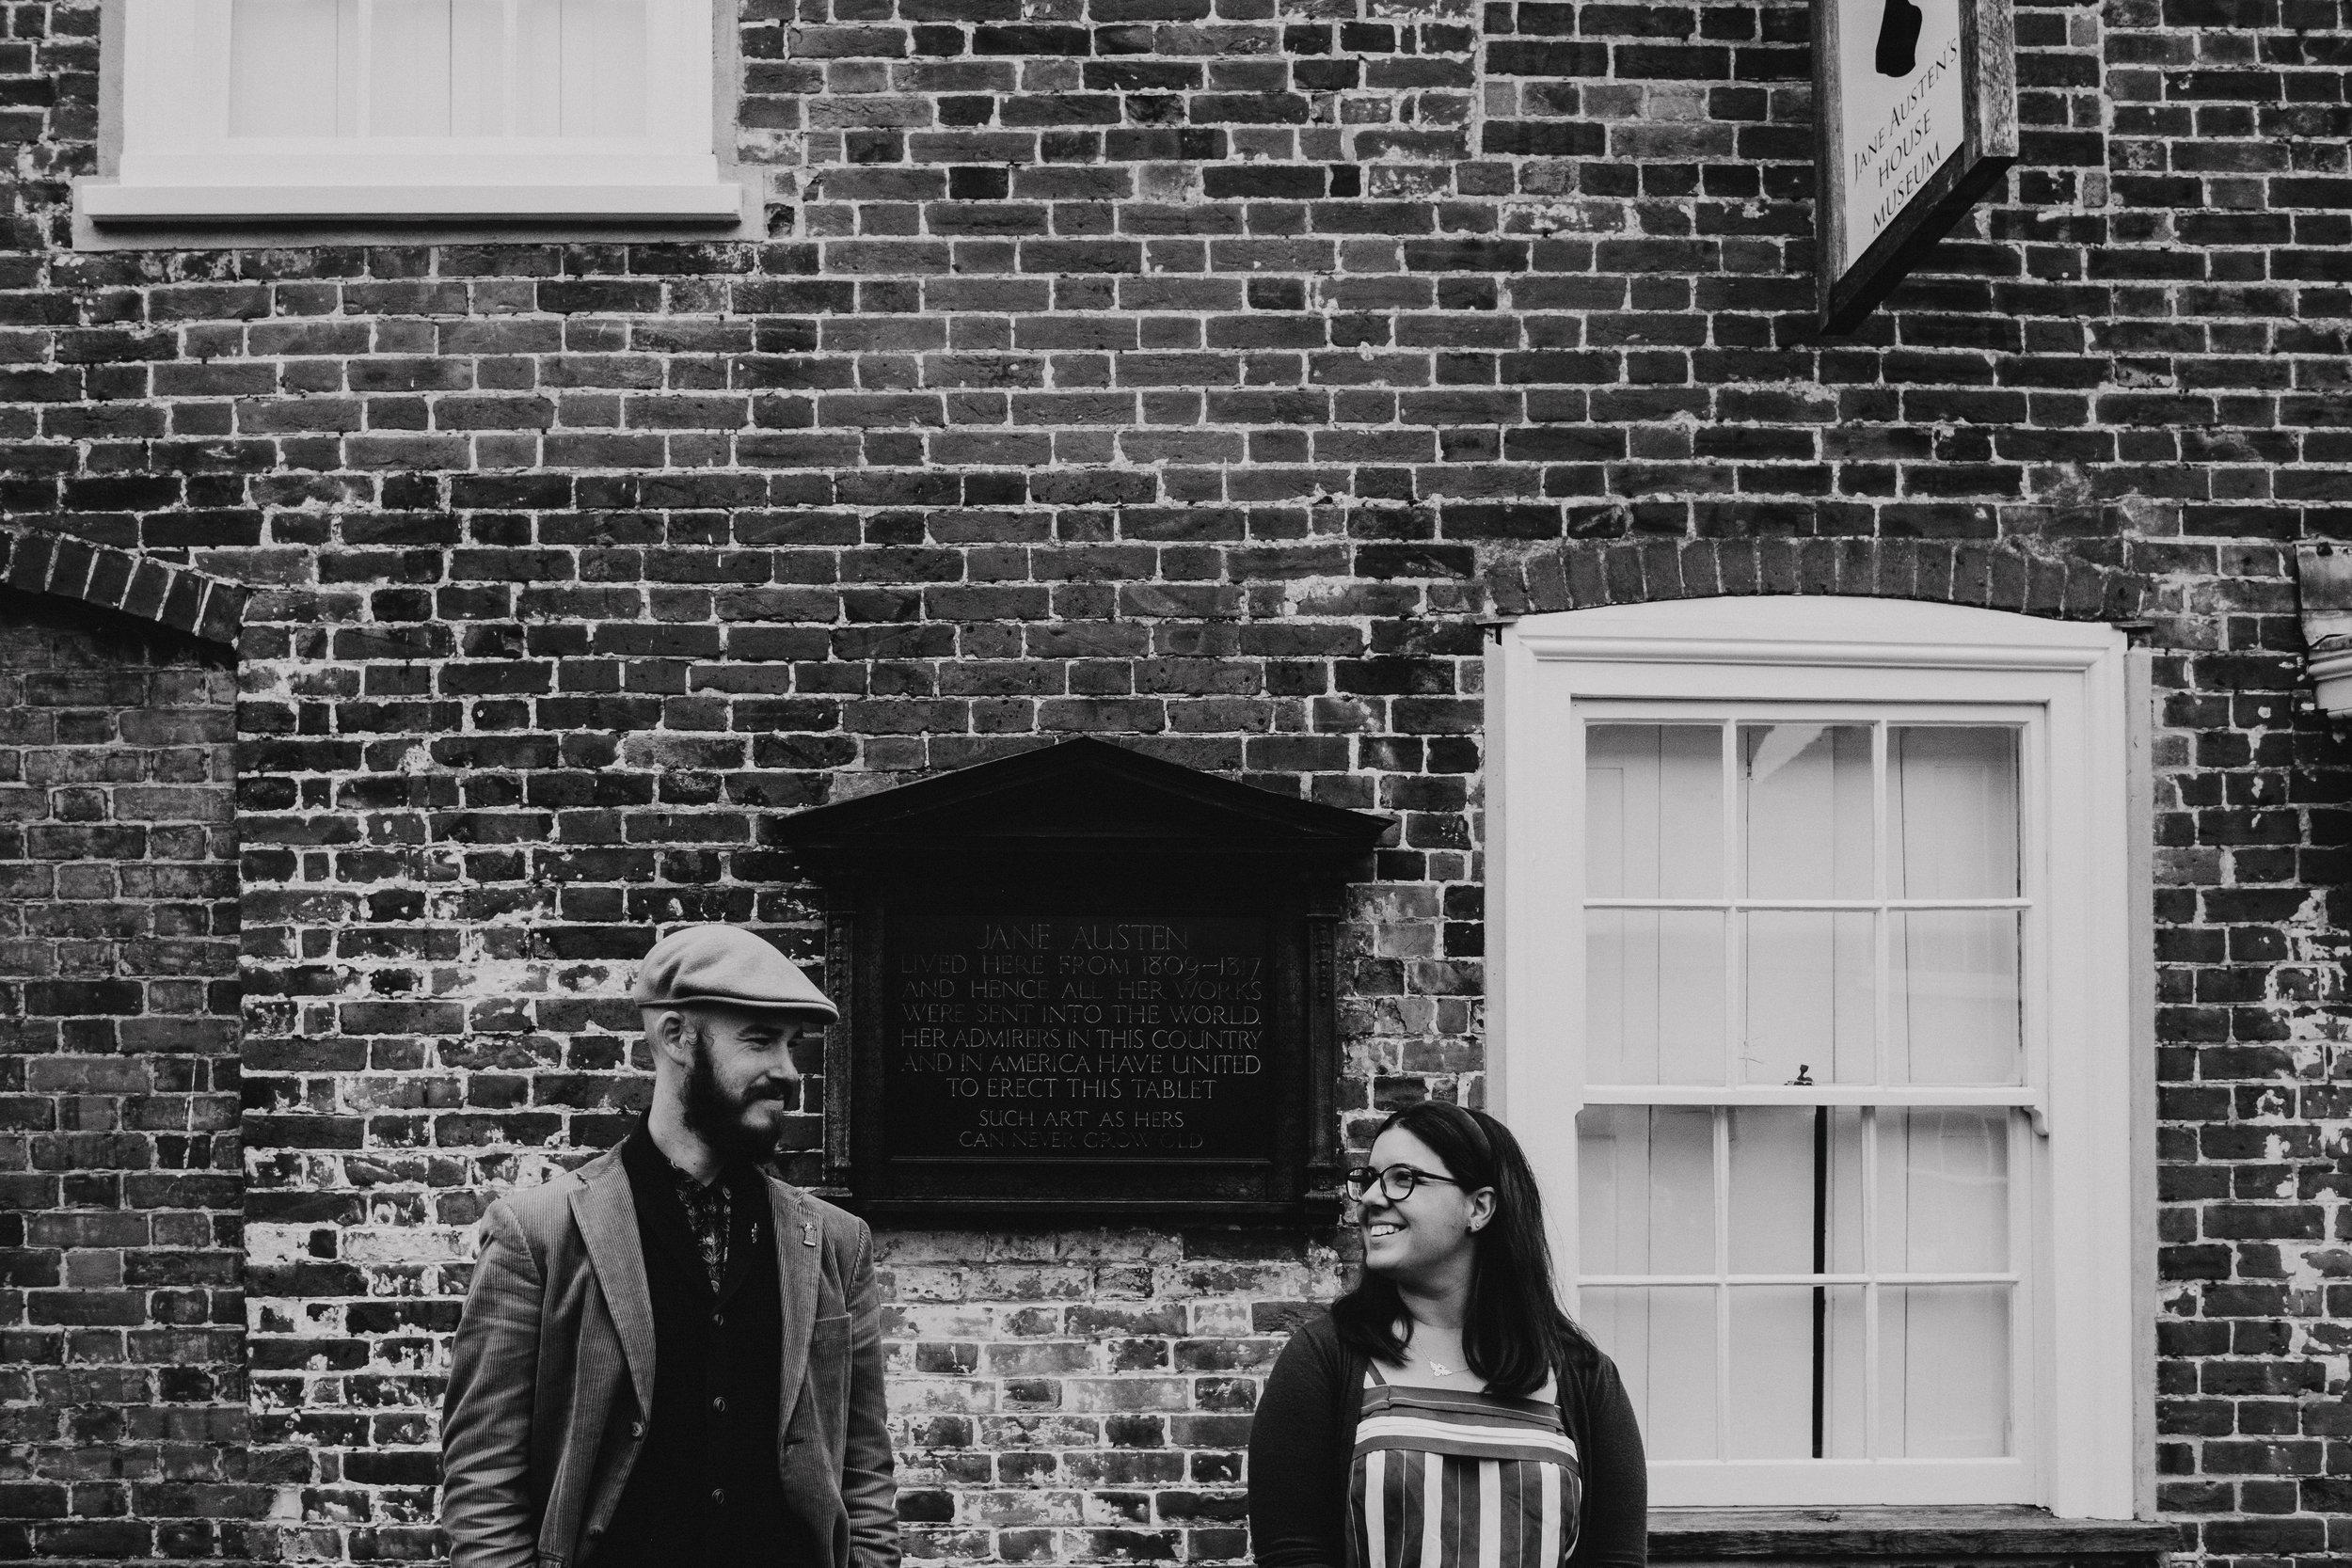 Lara and David engagement shoot at Jane Austen's house museum